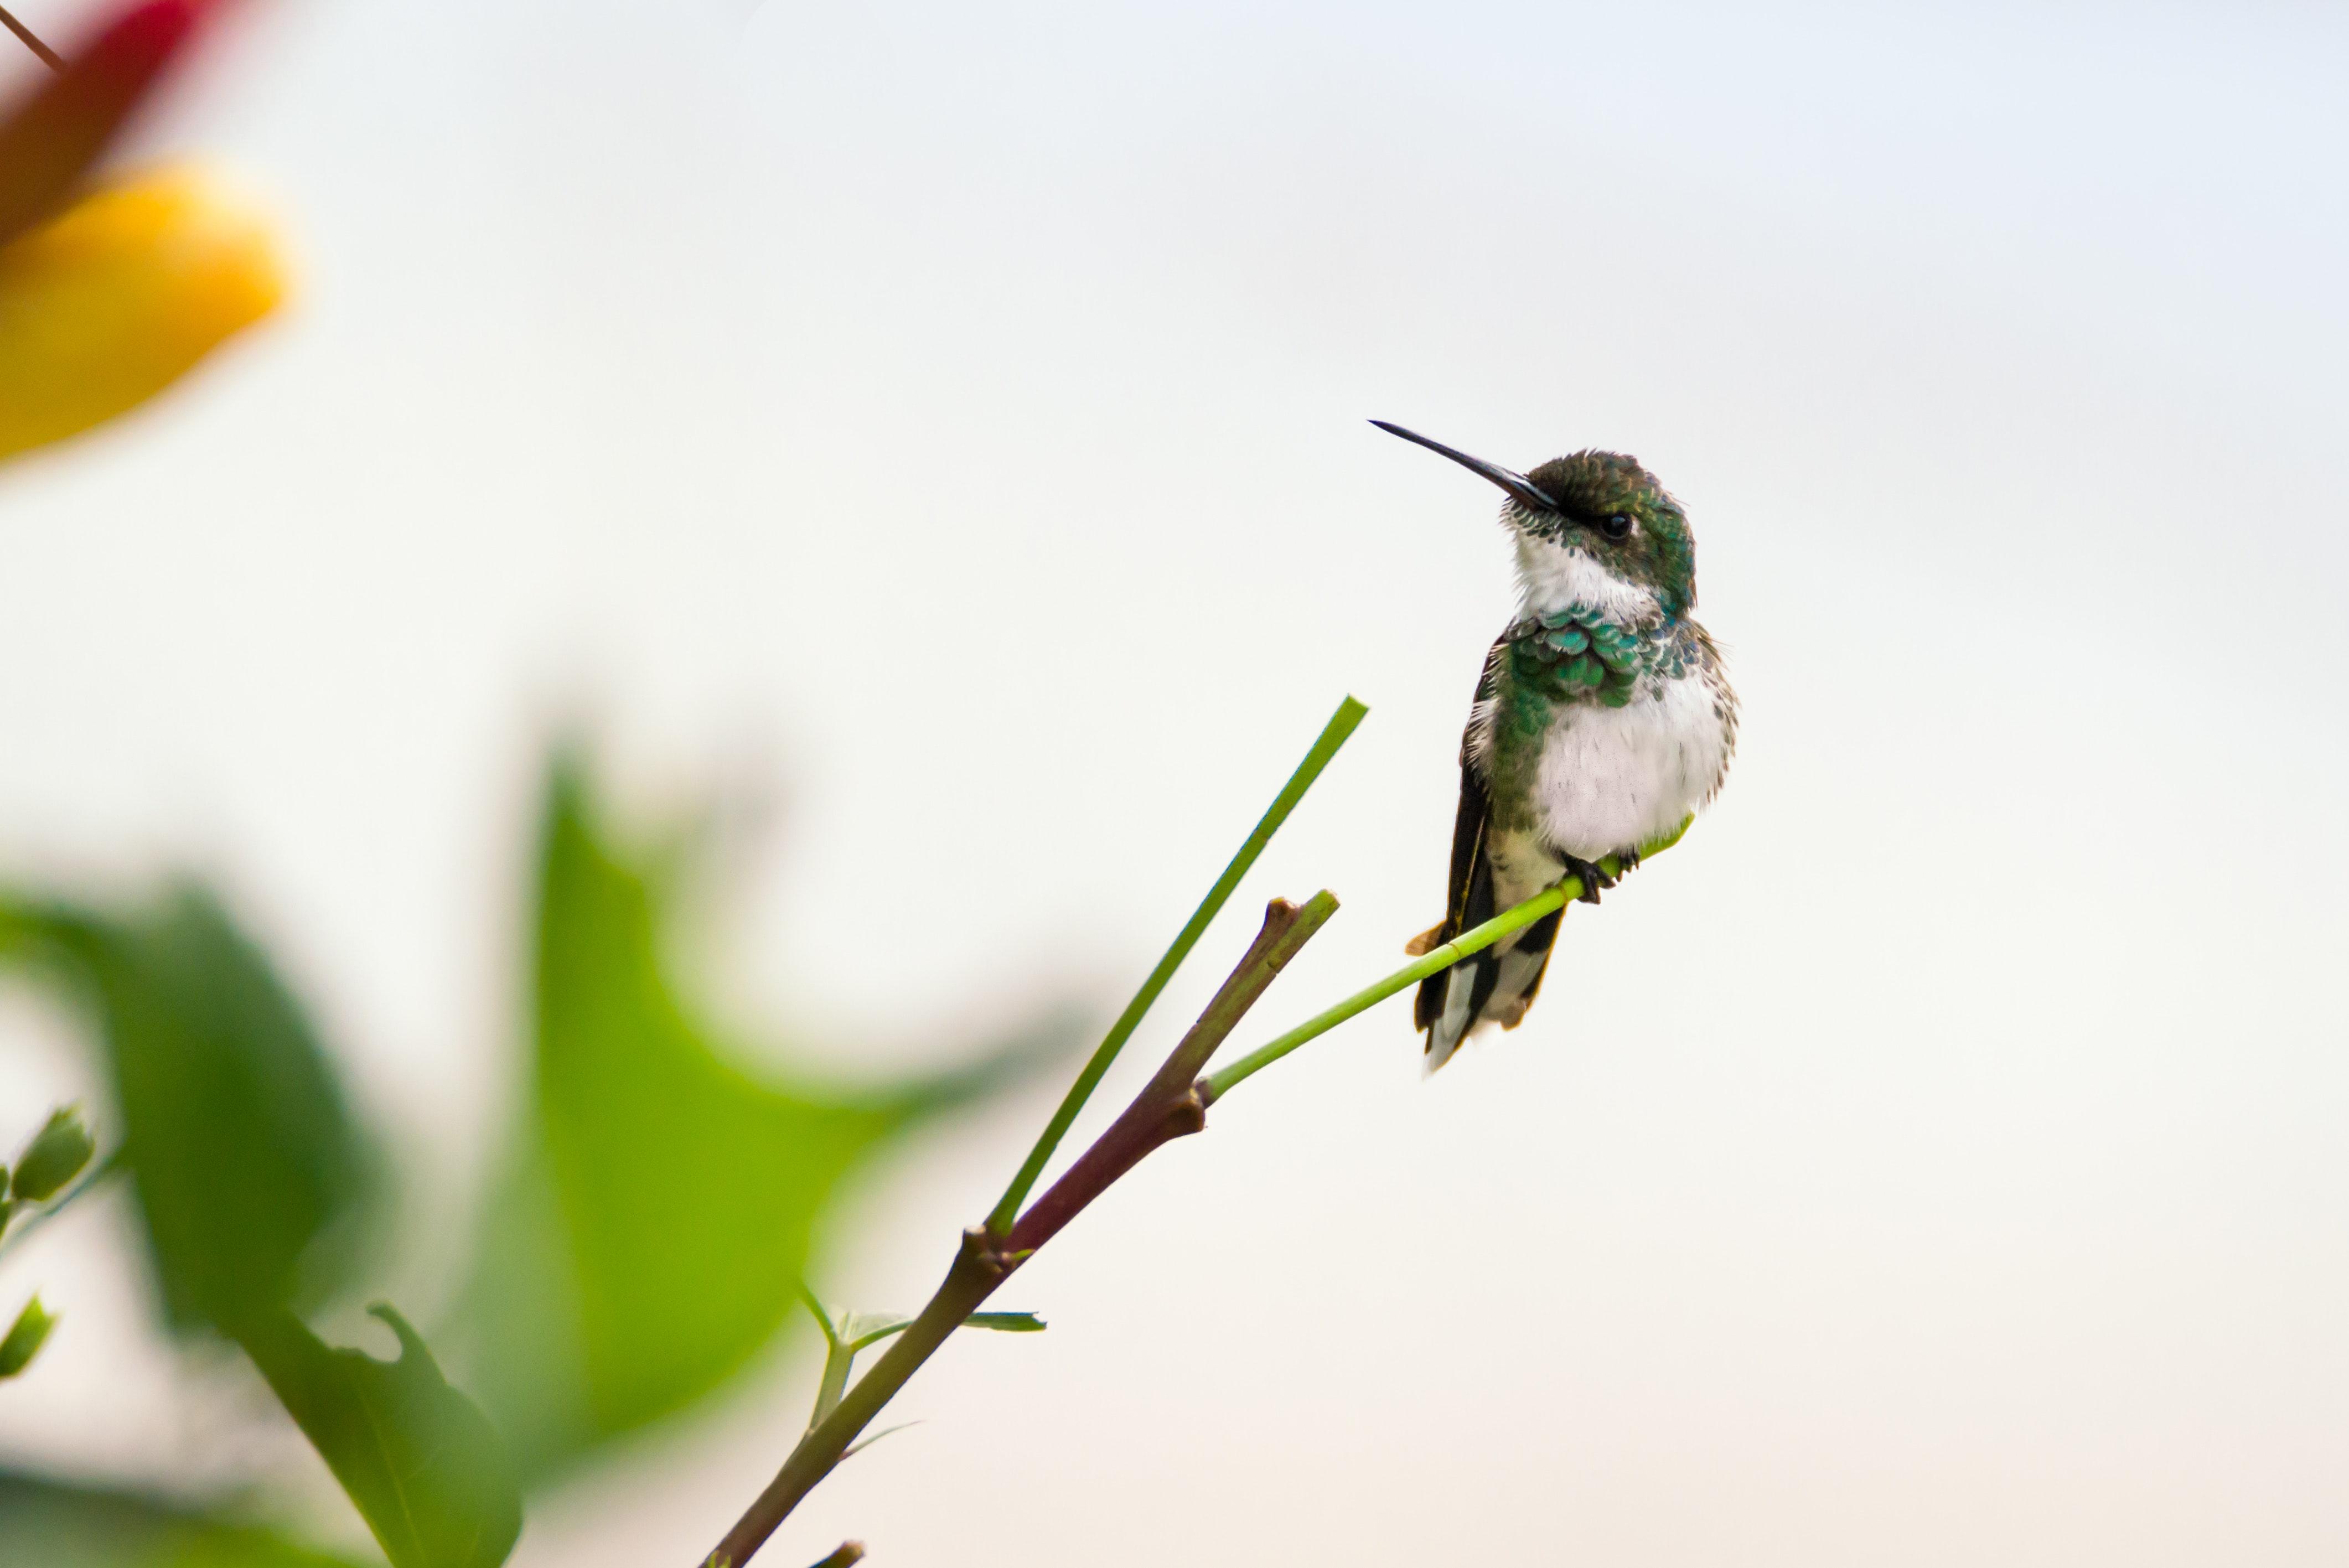 Hummingbird on Plant, Animal, Leaves, Wild, Tiny, HQ Photo